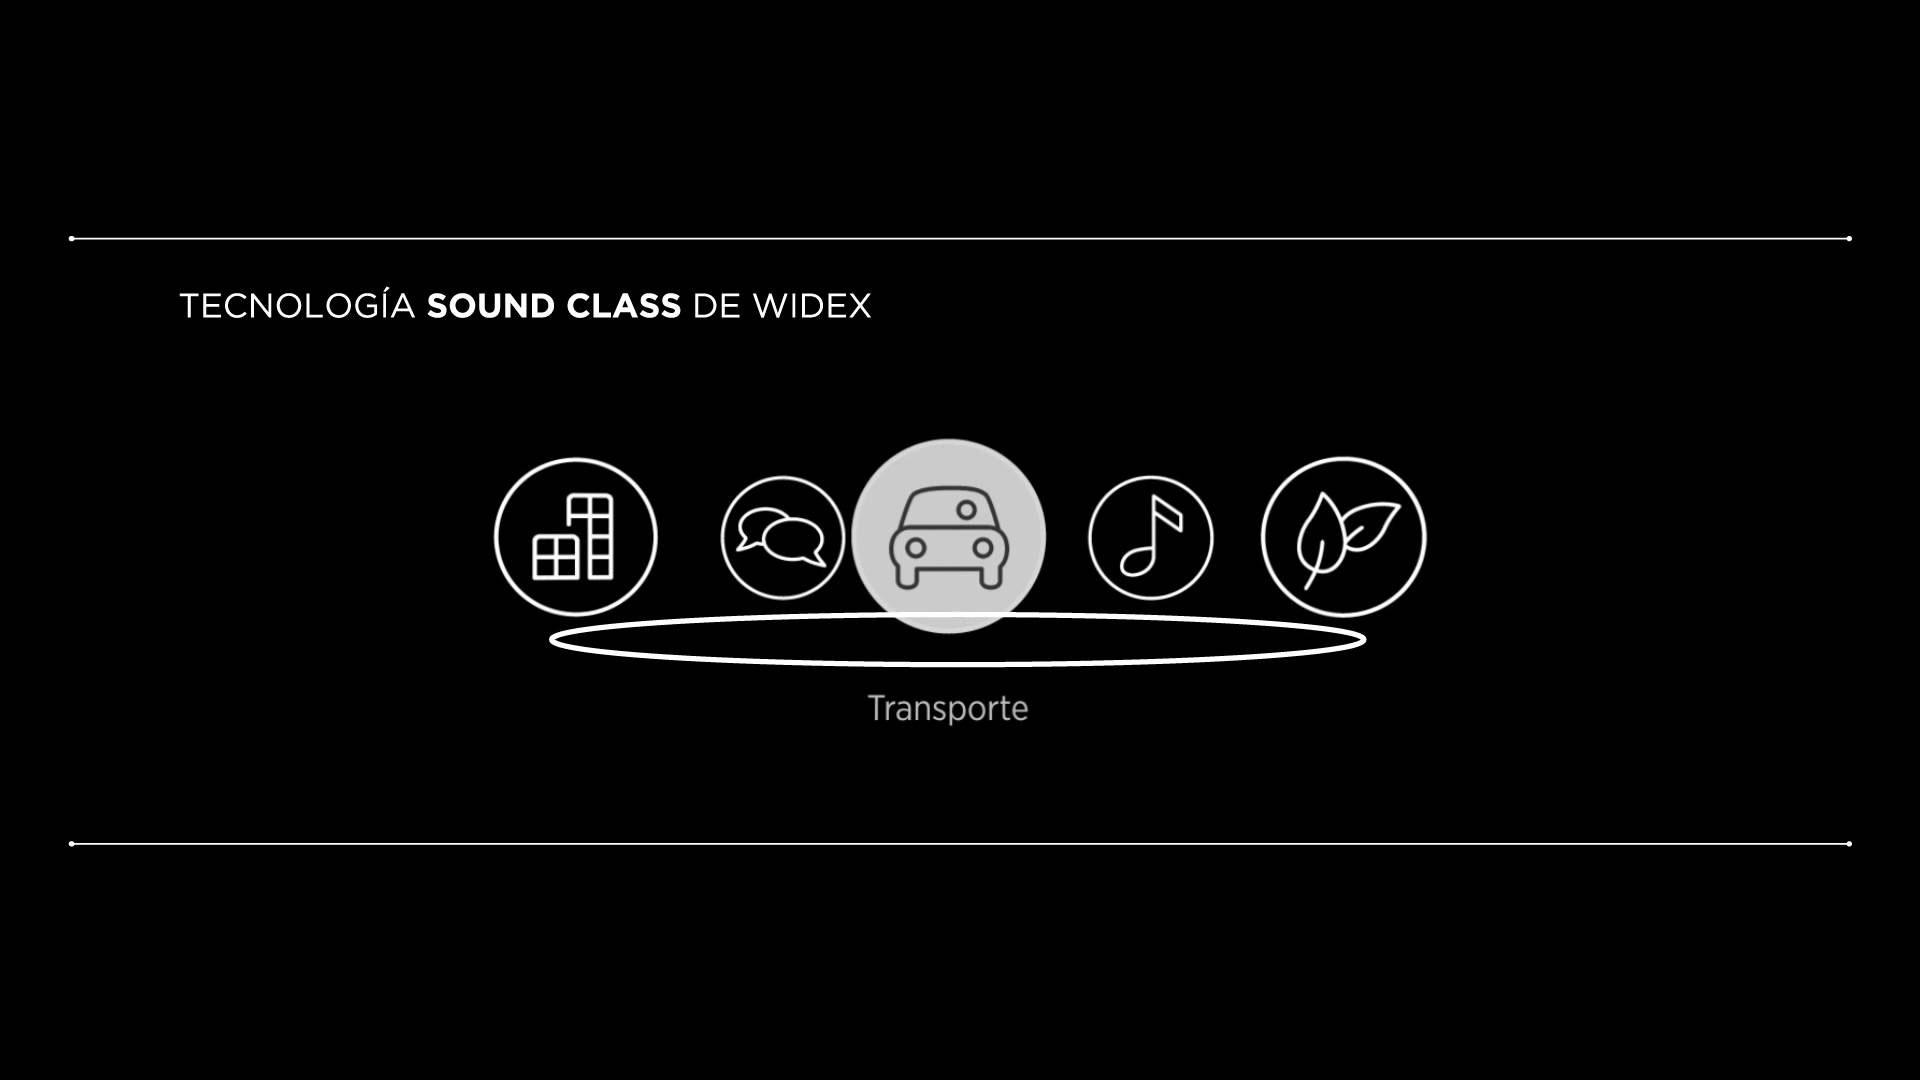 tecnologia-sound-class-widex-GA